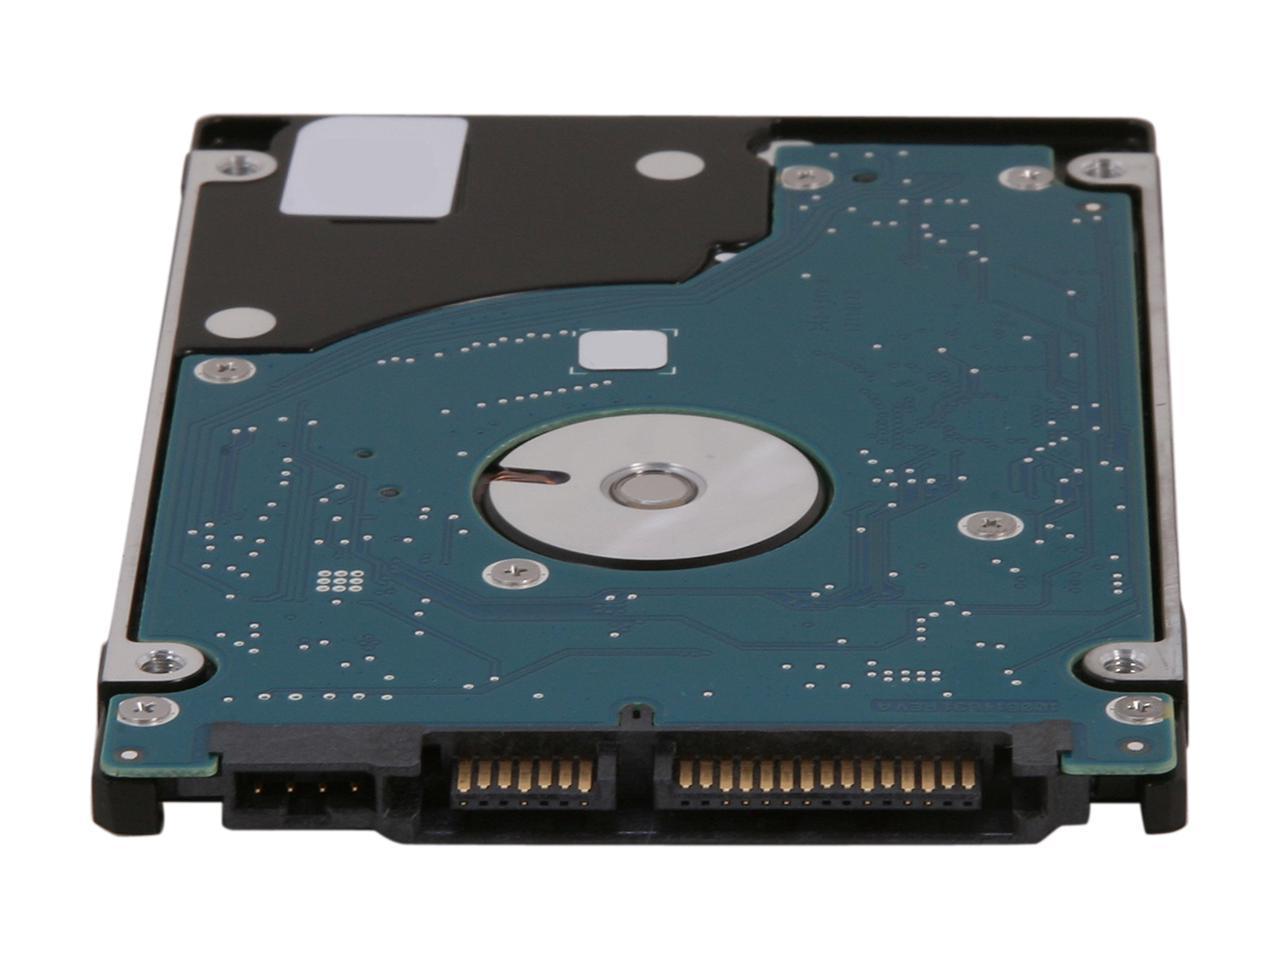 Seagate Momentus Thin 7200 320GB (ST320LT007) | T.S.BOHEMIA